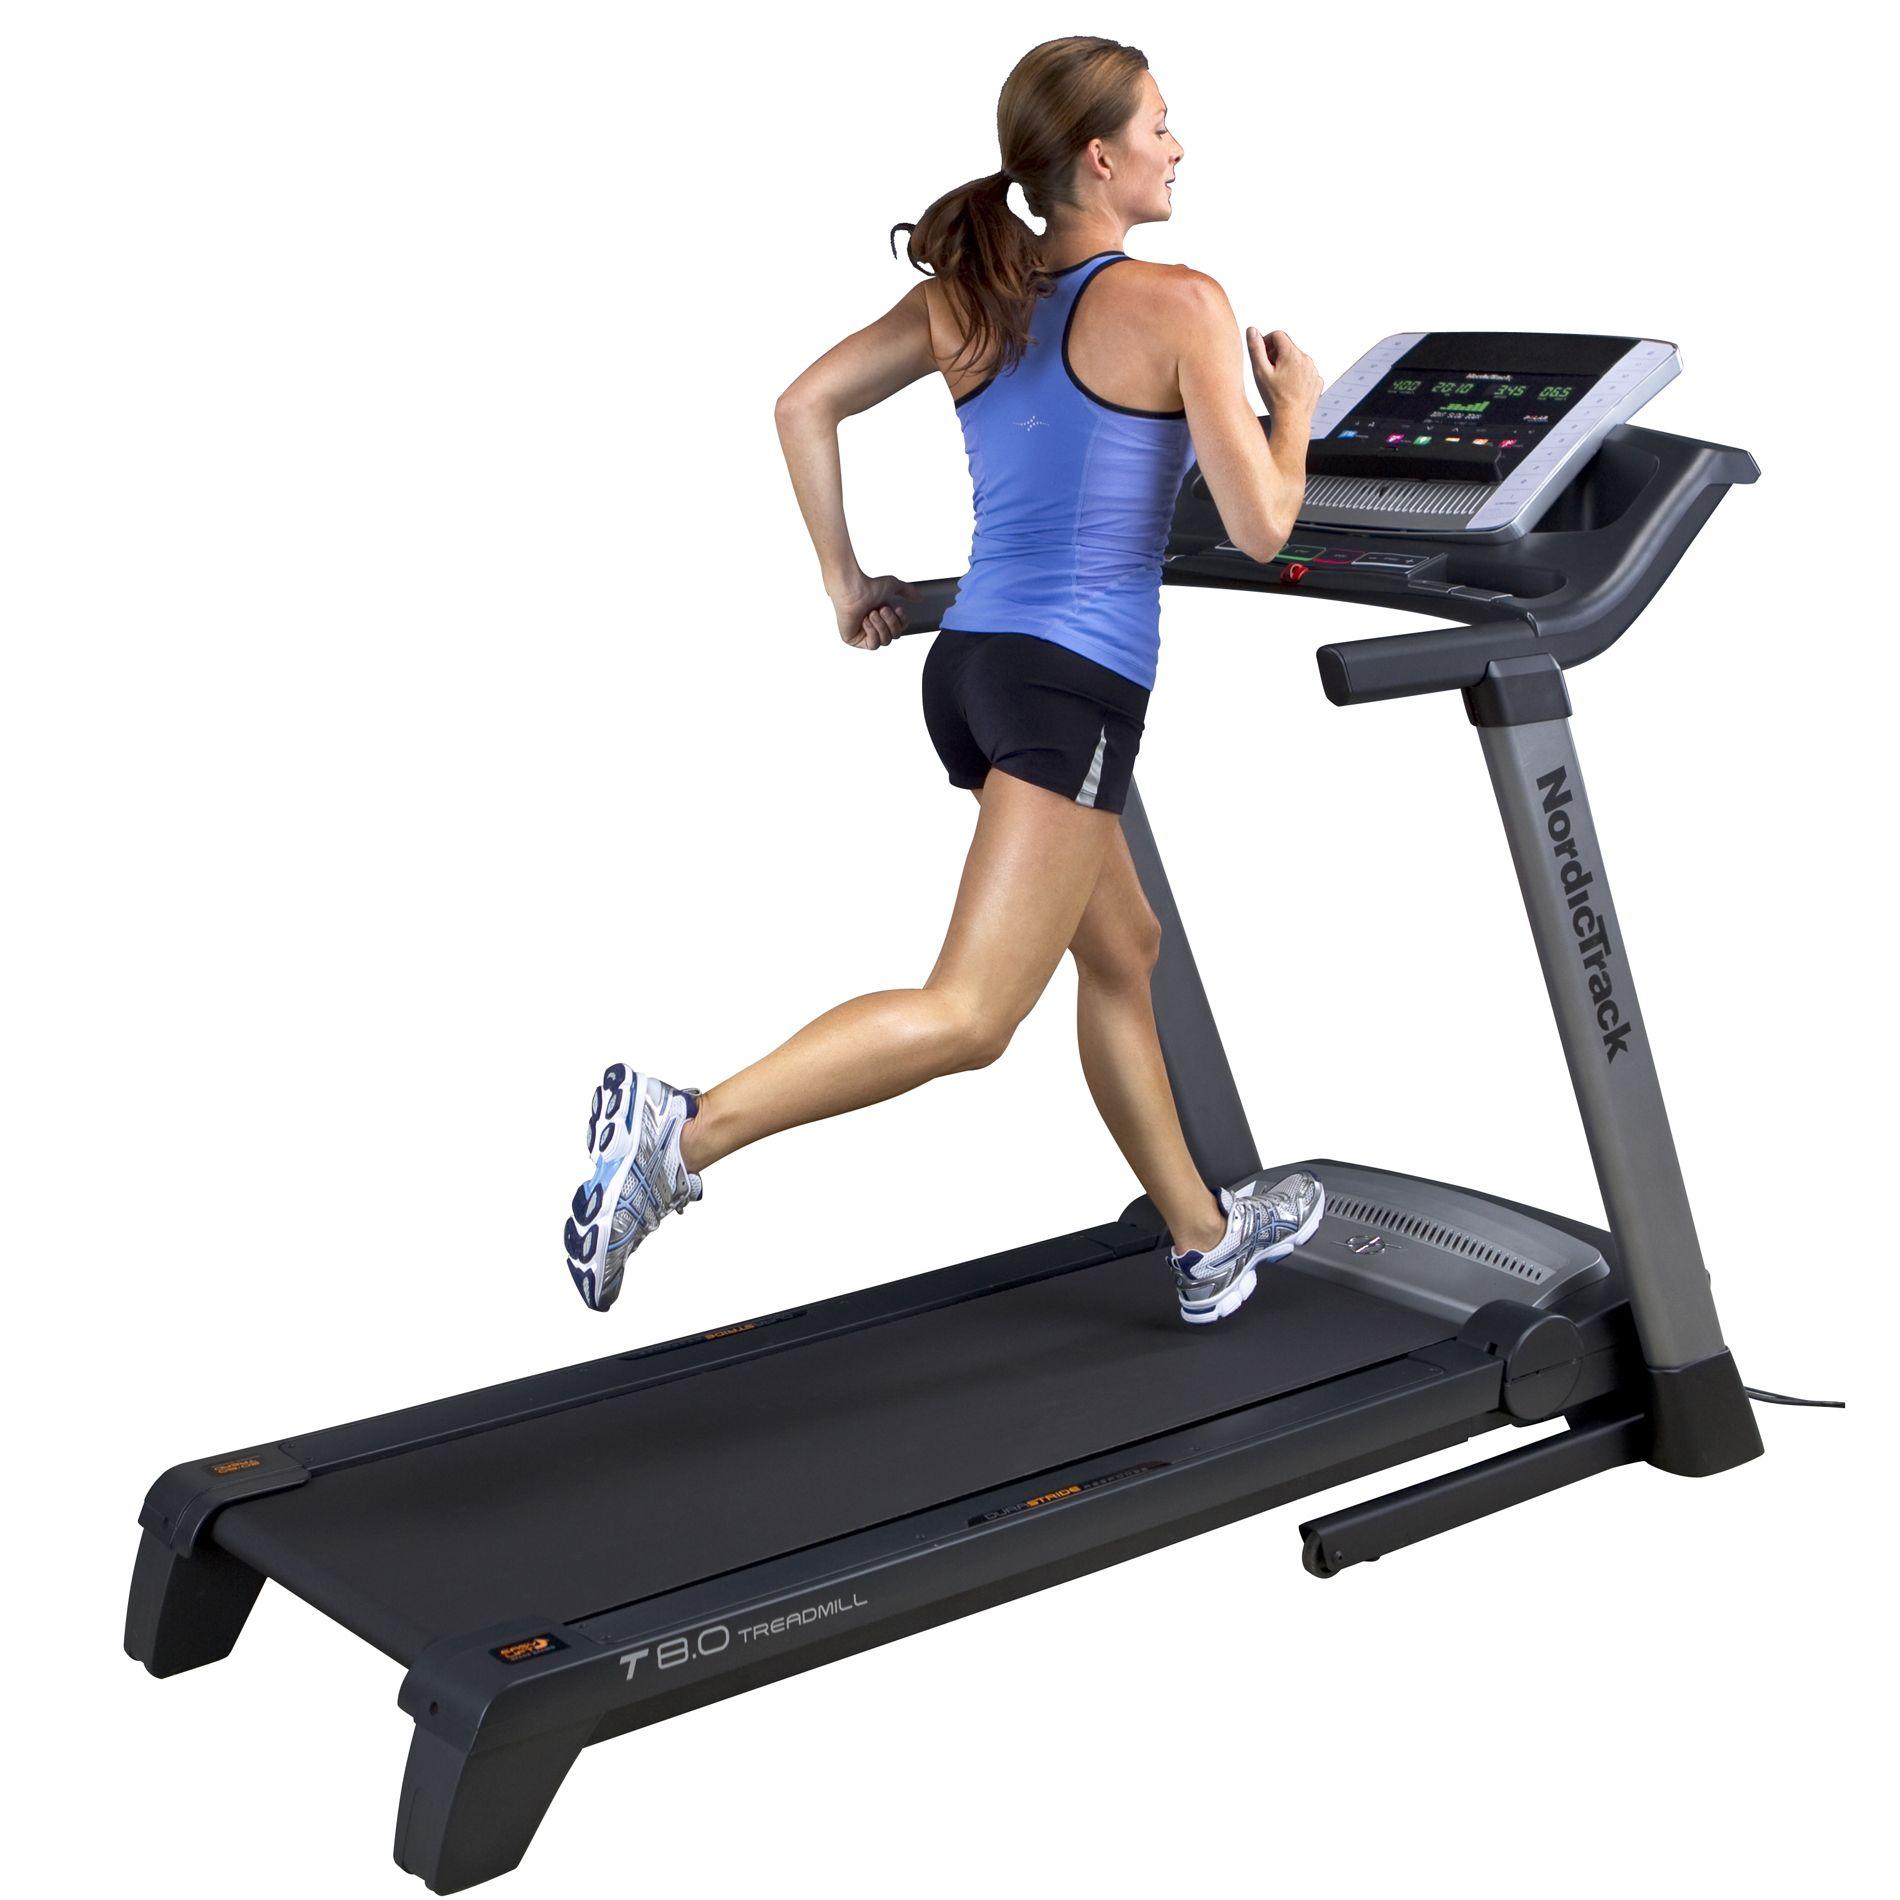 NordicTrack Treadmill T8.0